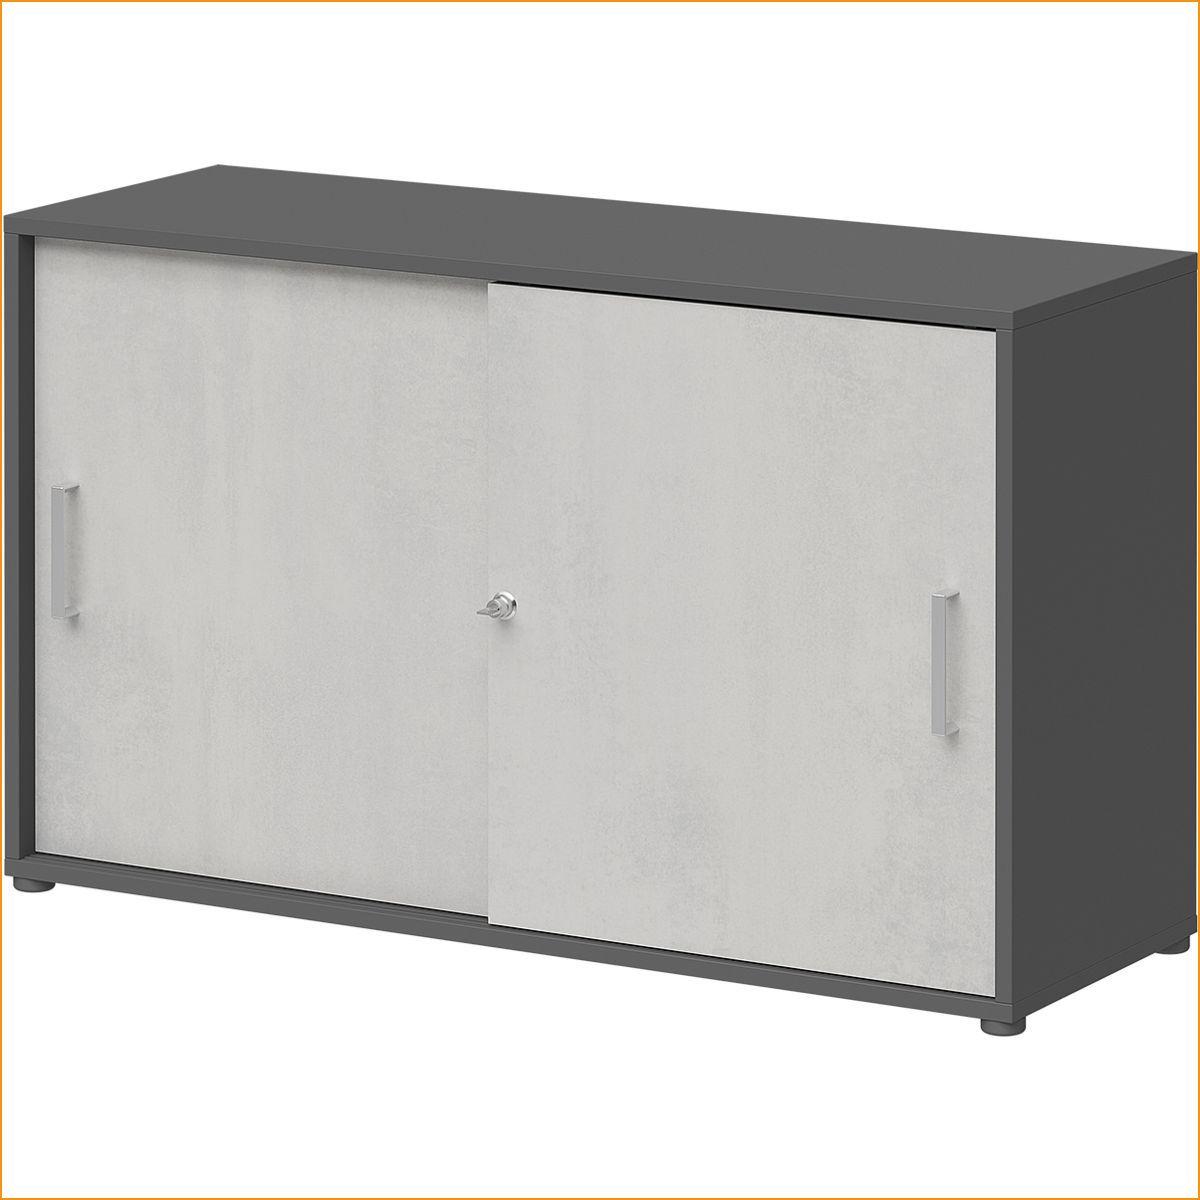 14 Friedlich Garderobe 120 Cm Breit Garderobe100 In 2020 Locker